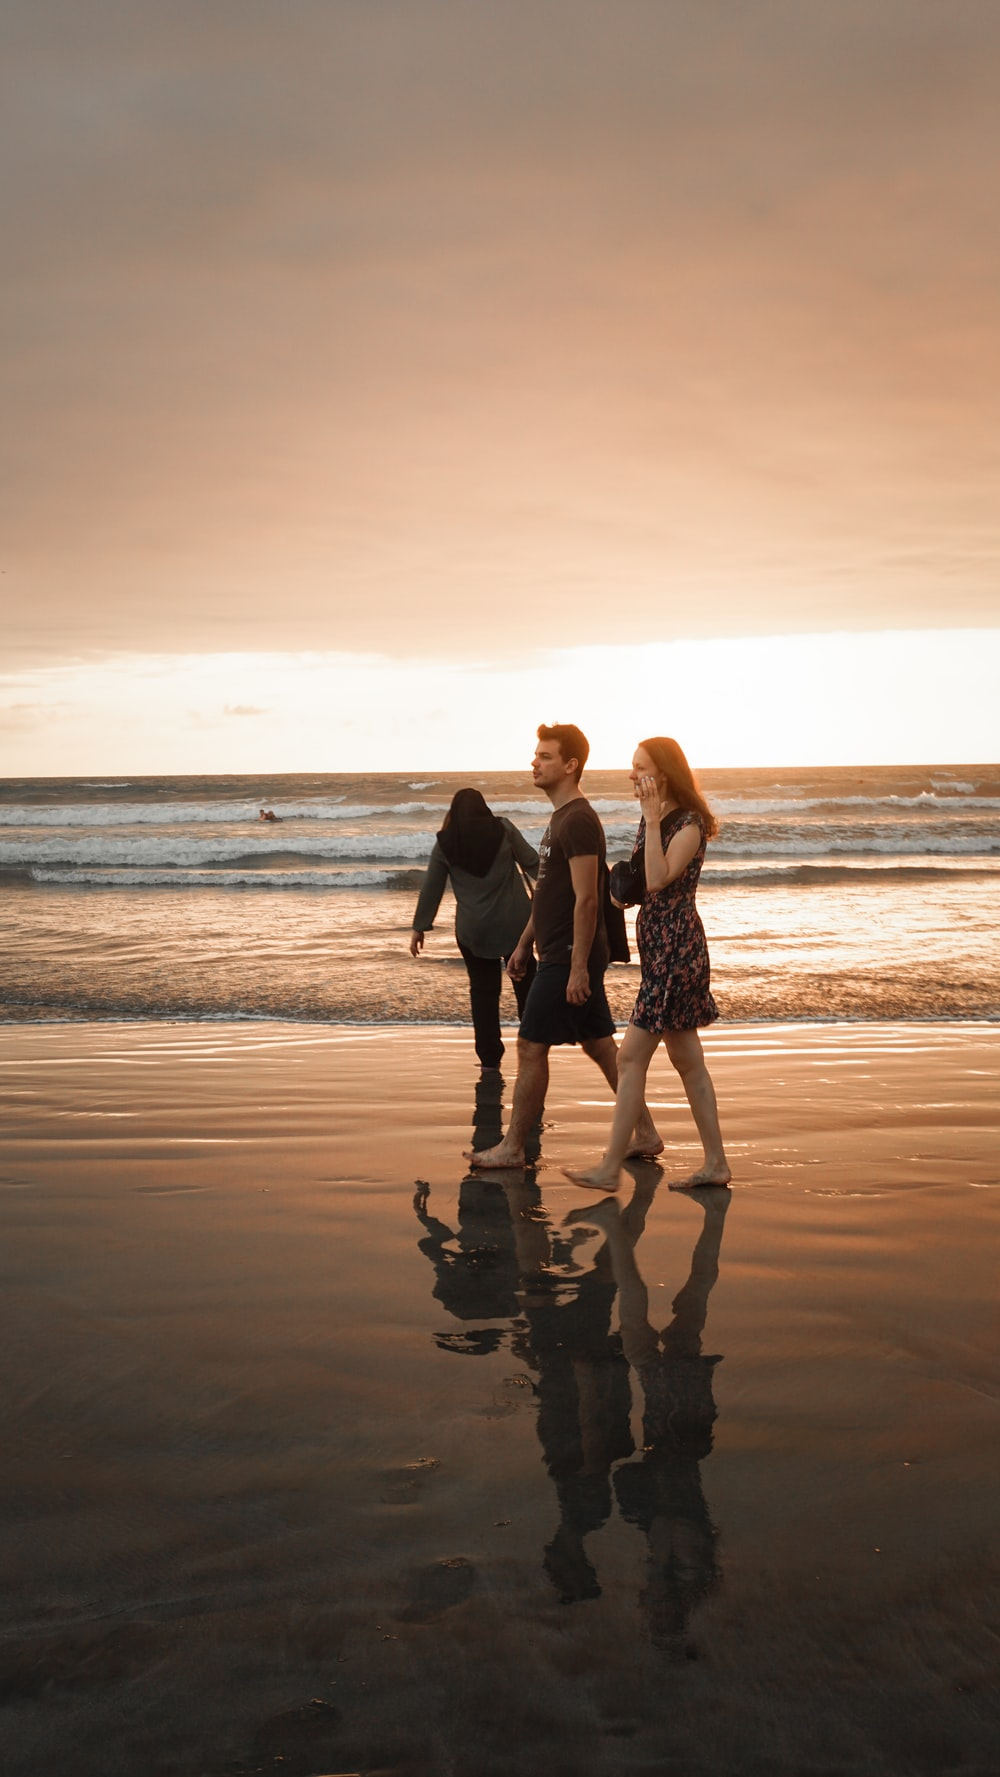 two women and man walking on seashore